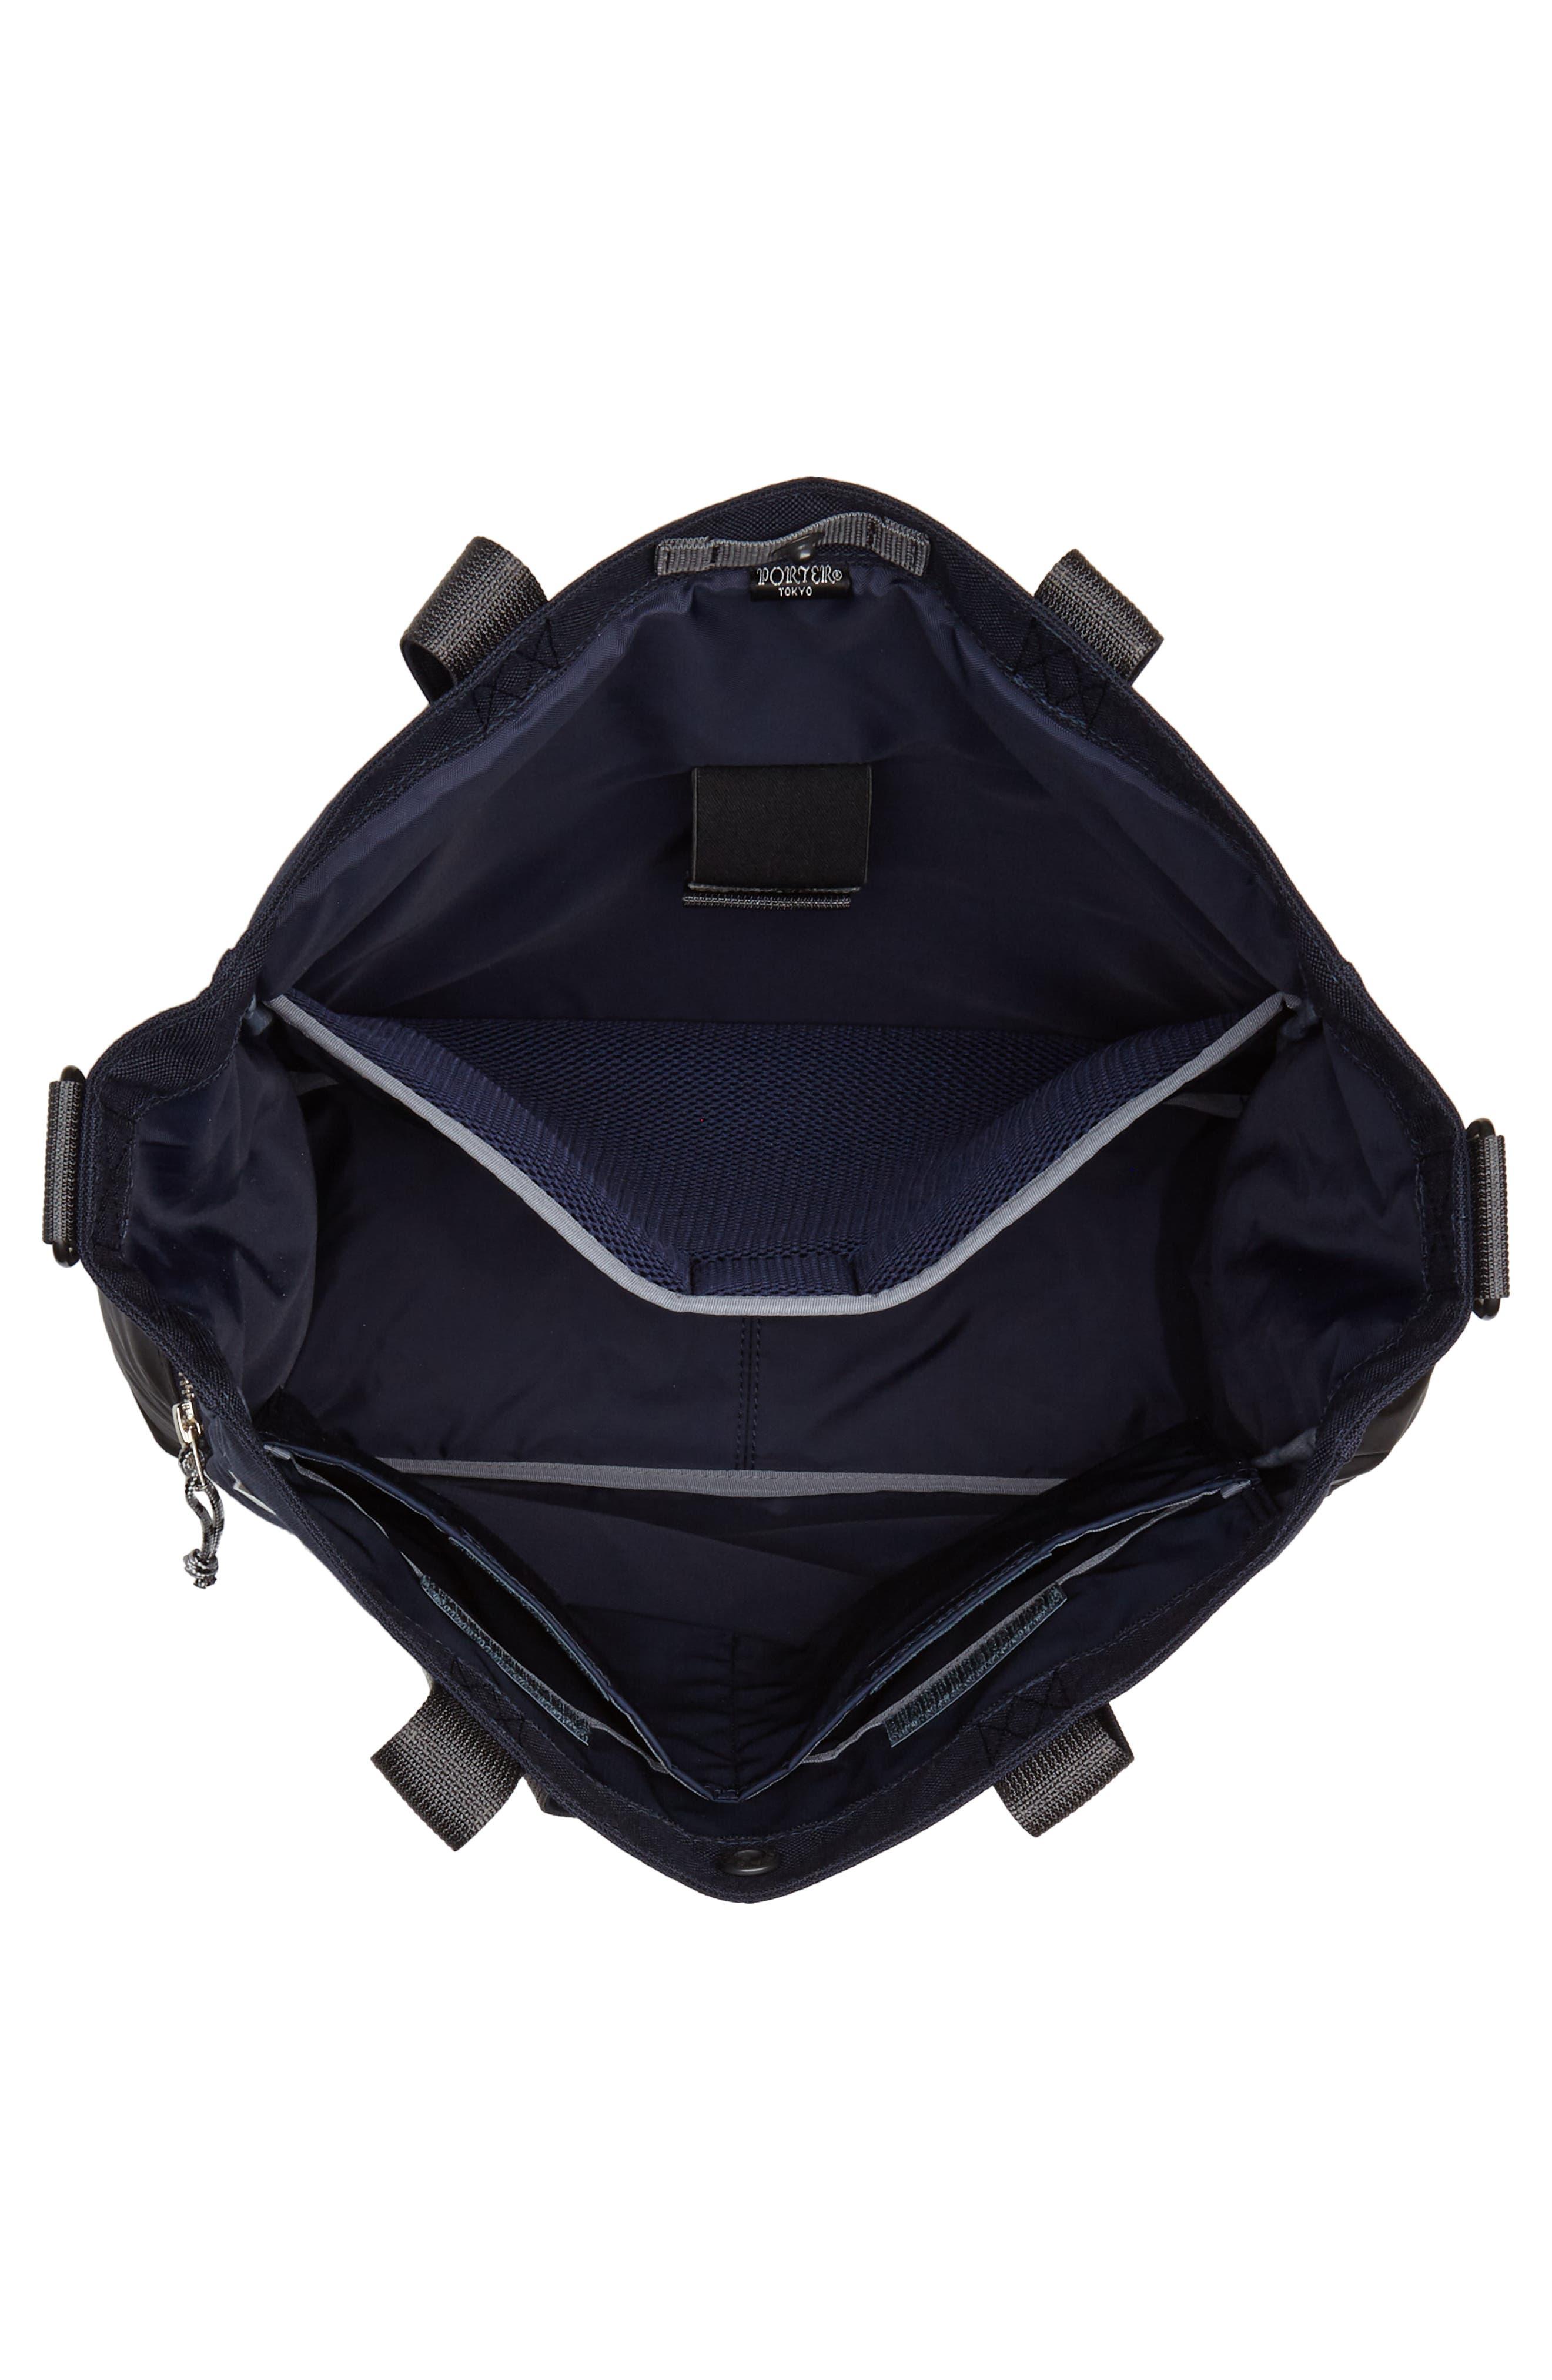 Porter-Yoshida & Co. Hype Tote Bag,                             Alternate thumbnail 4, color,                             400